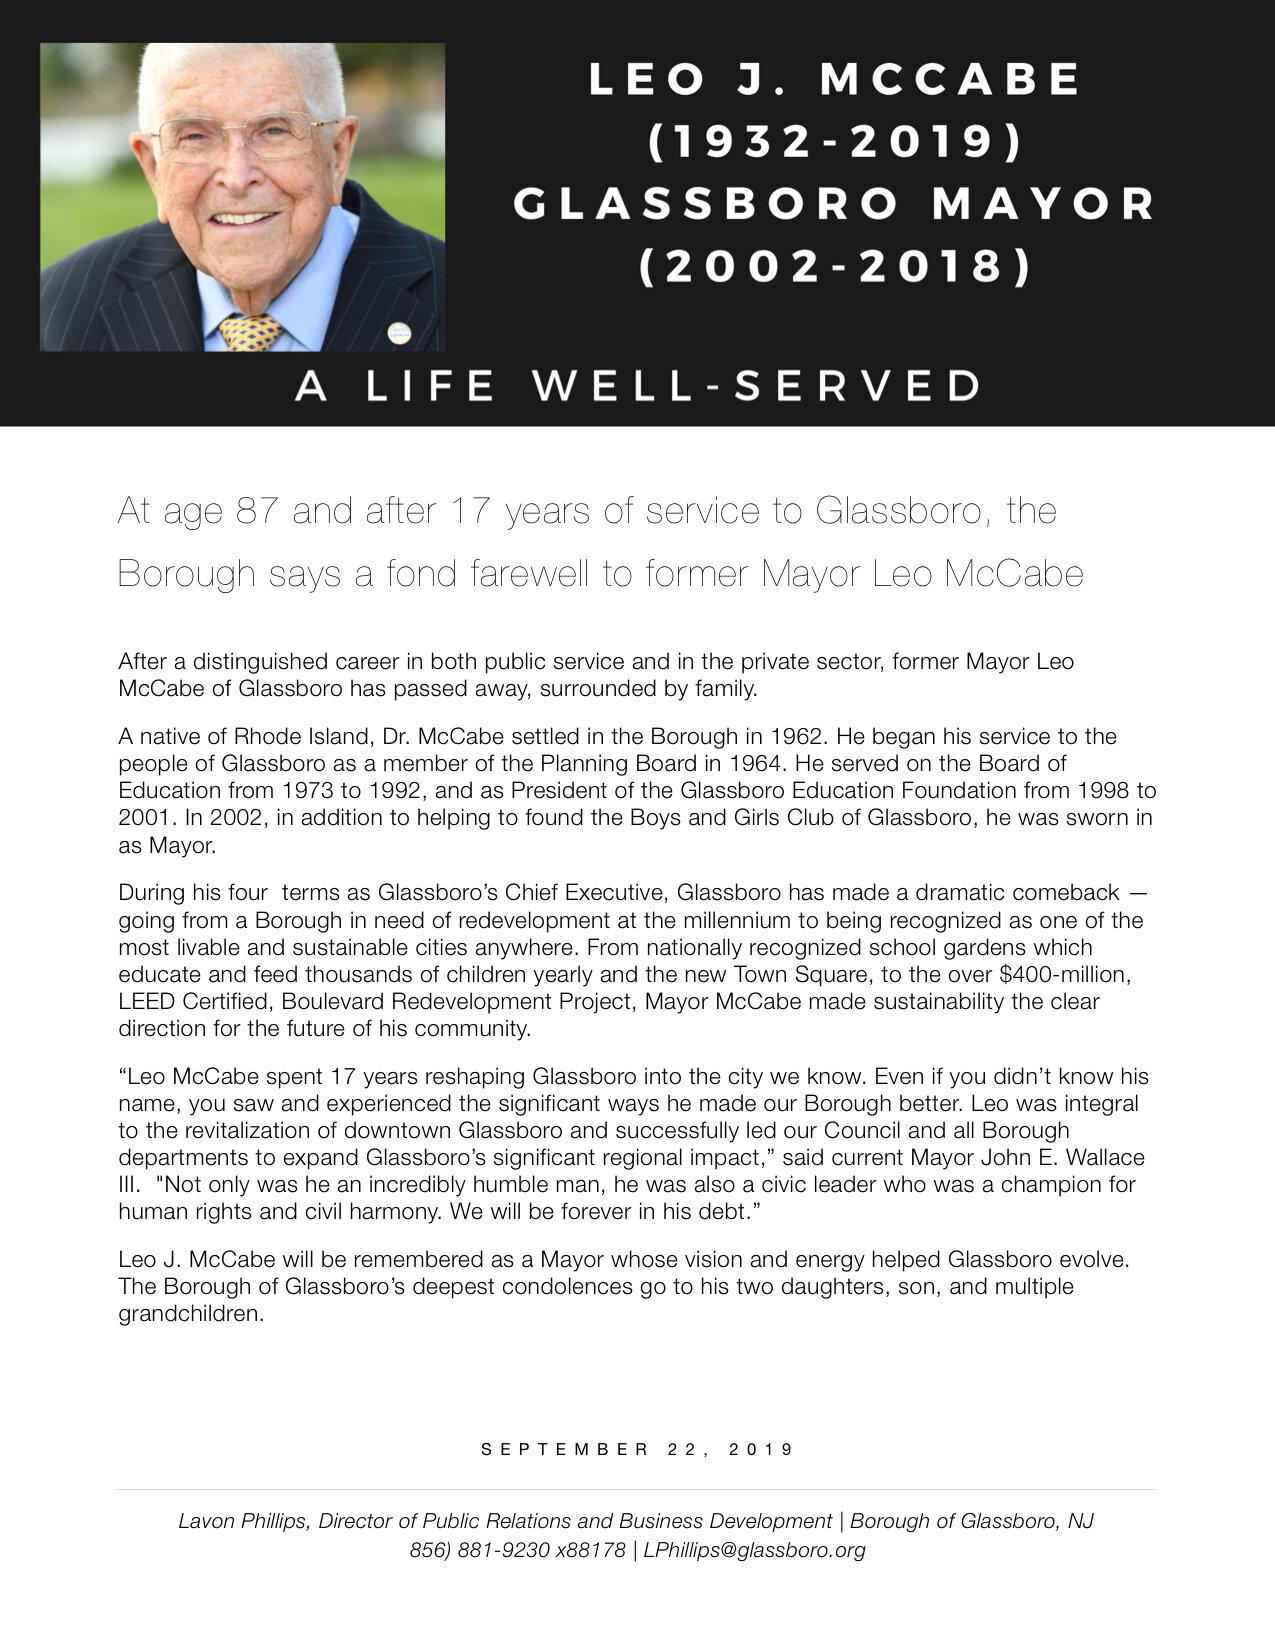 Glassboro NJ Press release Passing of Former Mayor Leo McCabe .jpeg